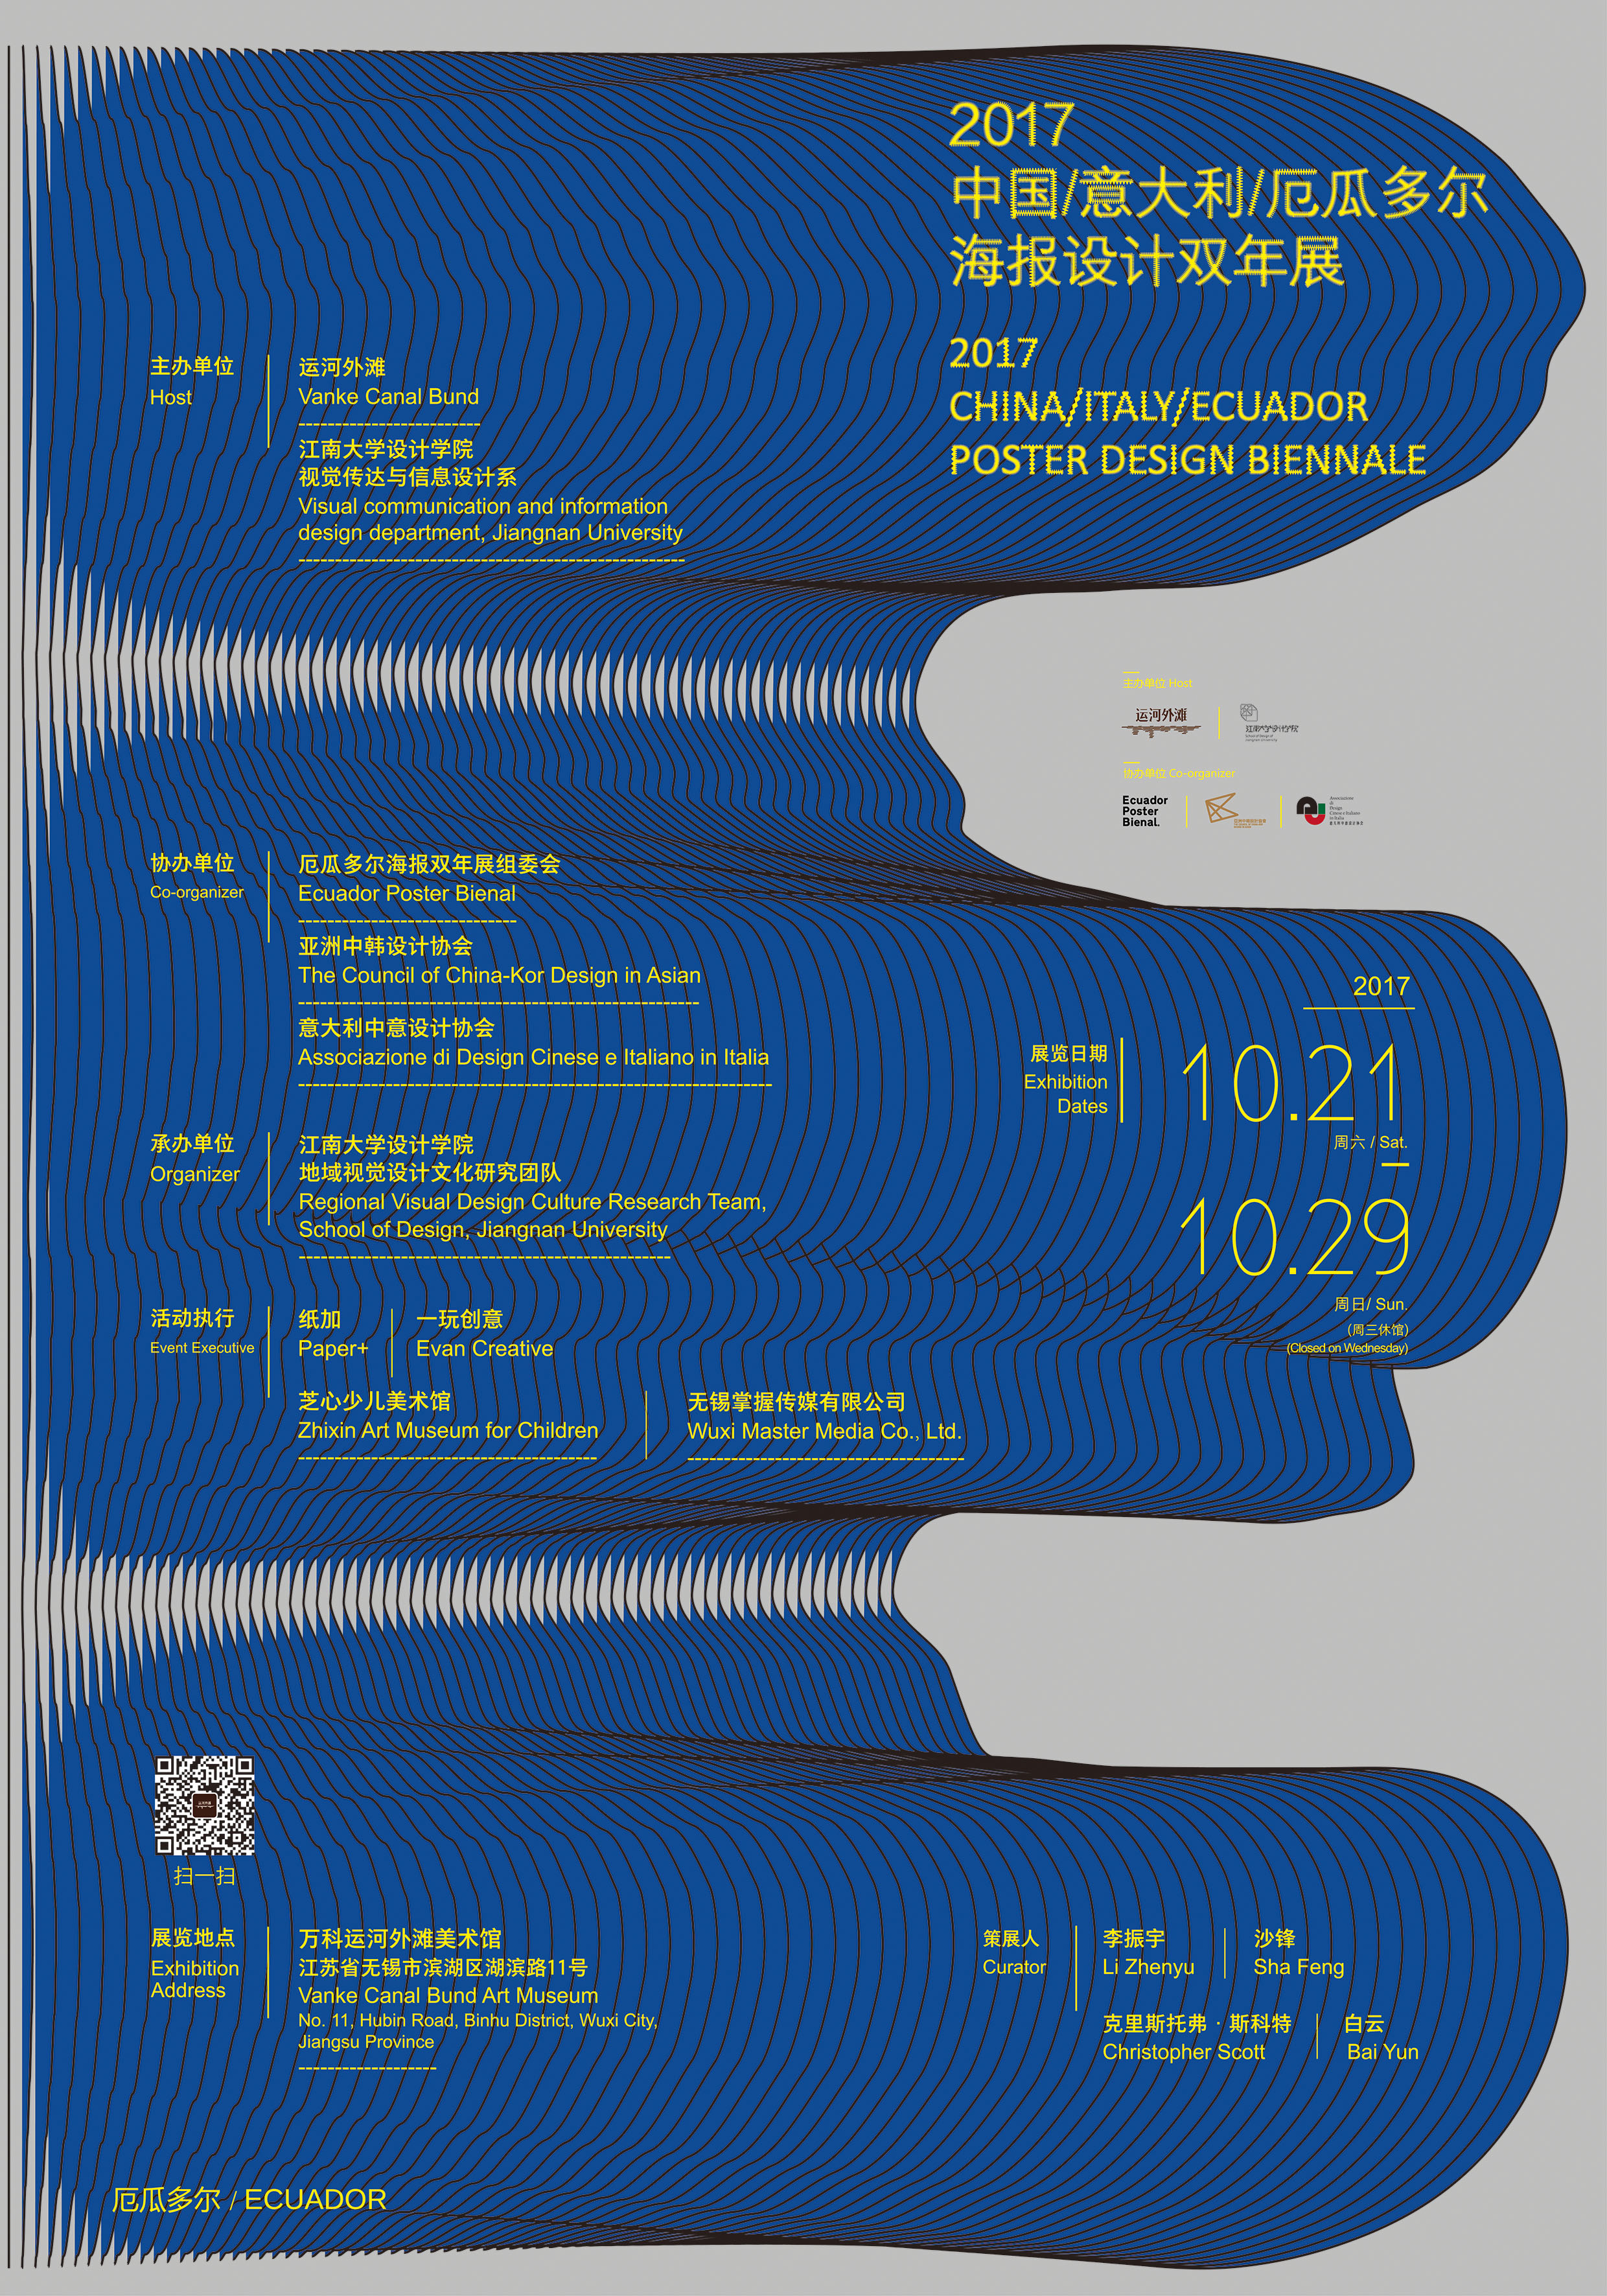 2017 China/Italy/Ecuador Poster Design Biennale-1